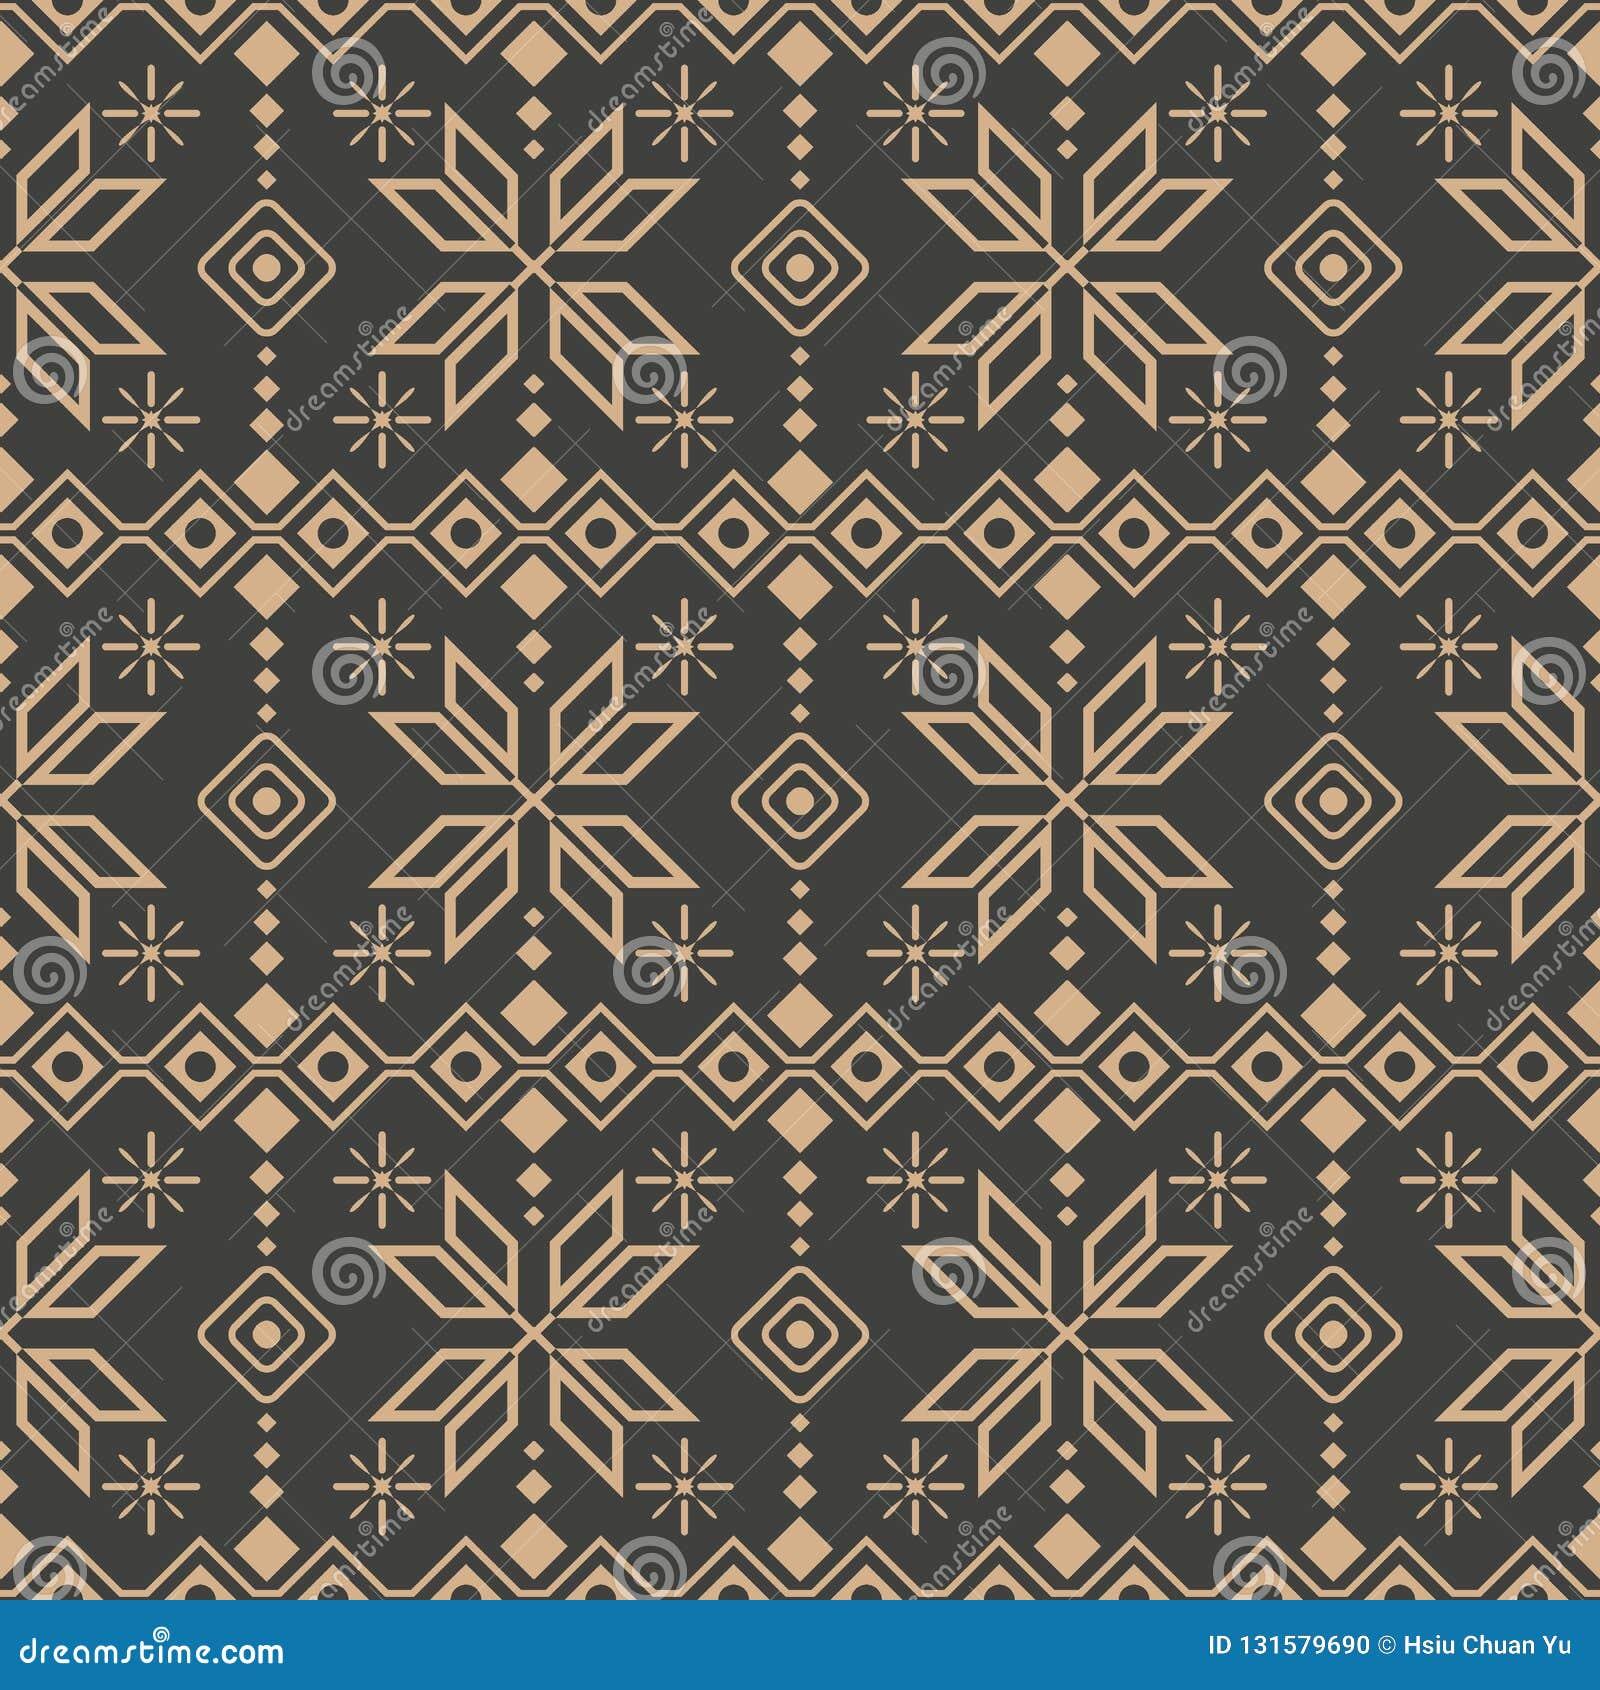 Vector damask seamless retro pattern background check polygon geometry cross star frame line flower. Elegant luxury brown tone